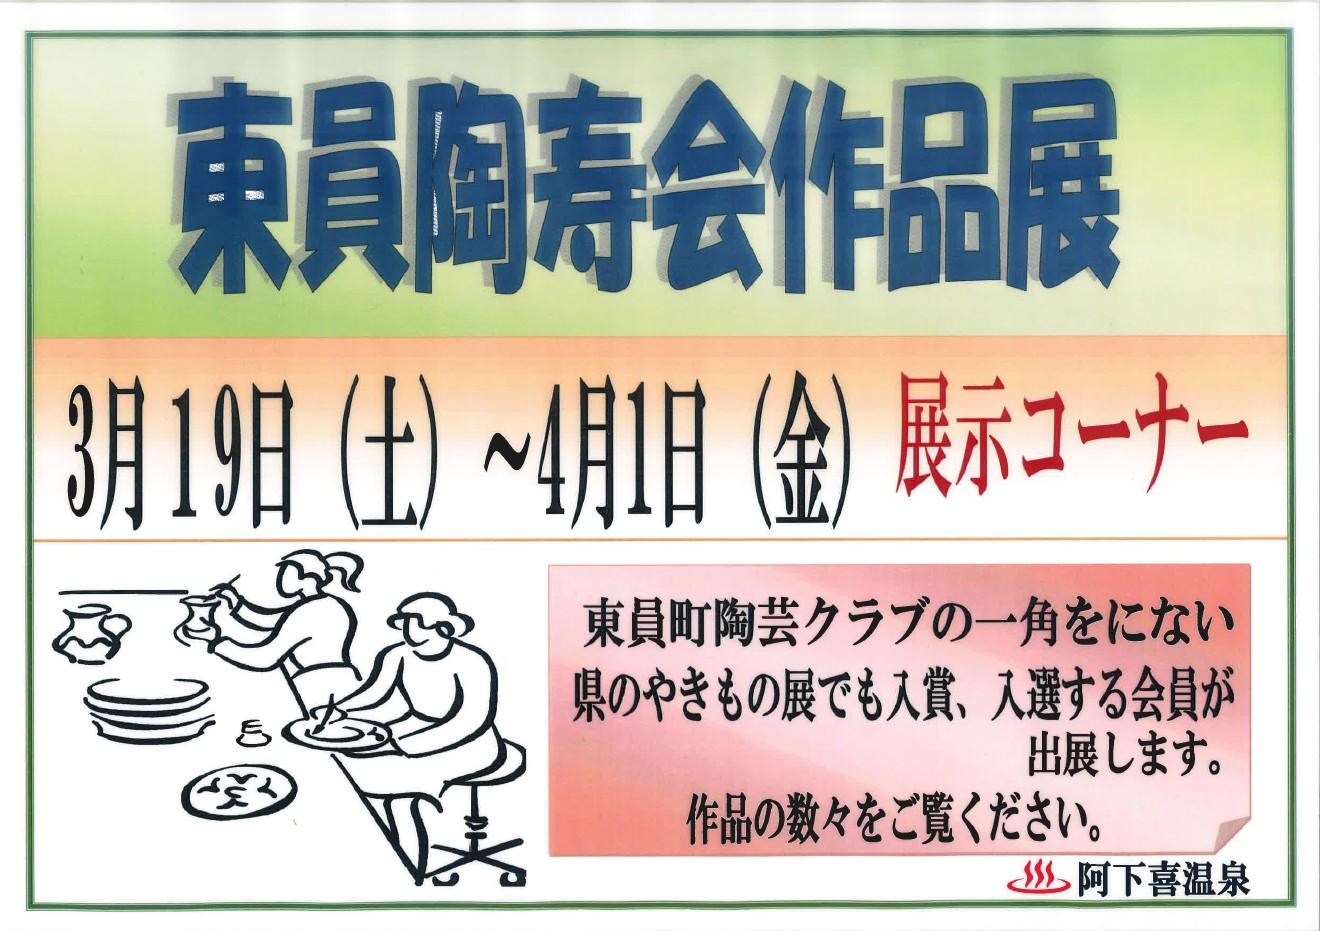 http://www.ajisainosato.com/info/images/2016y03m16d_162258185.jpg